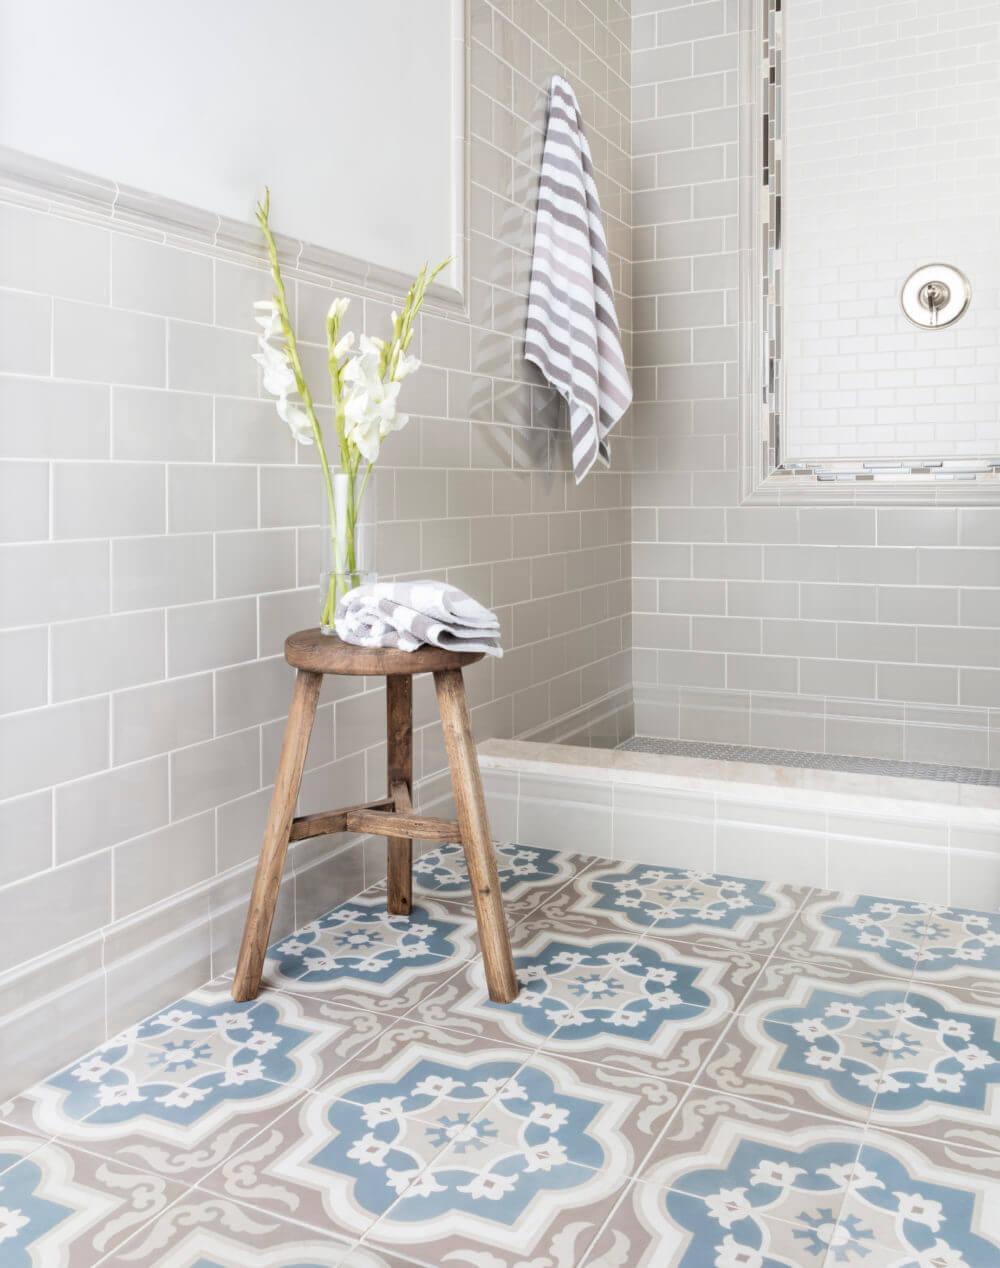 Attractive bathroom floor